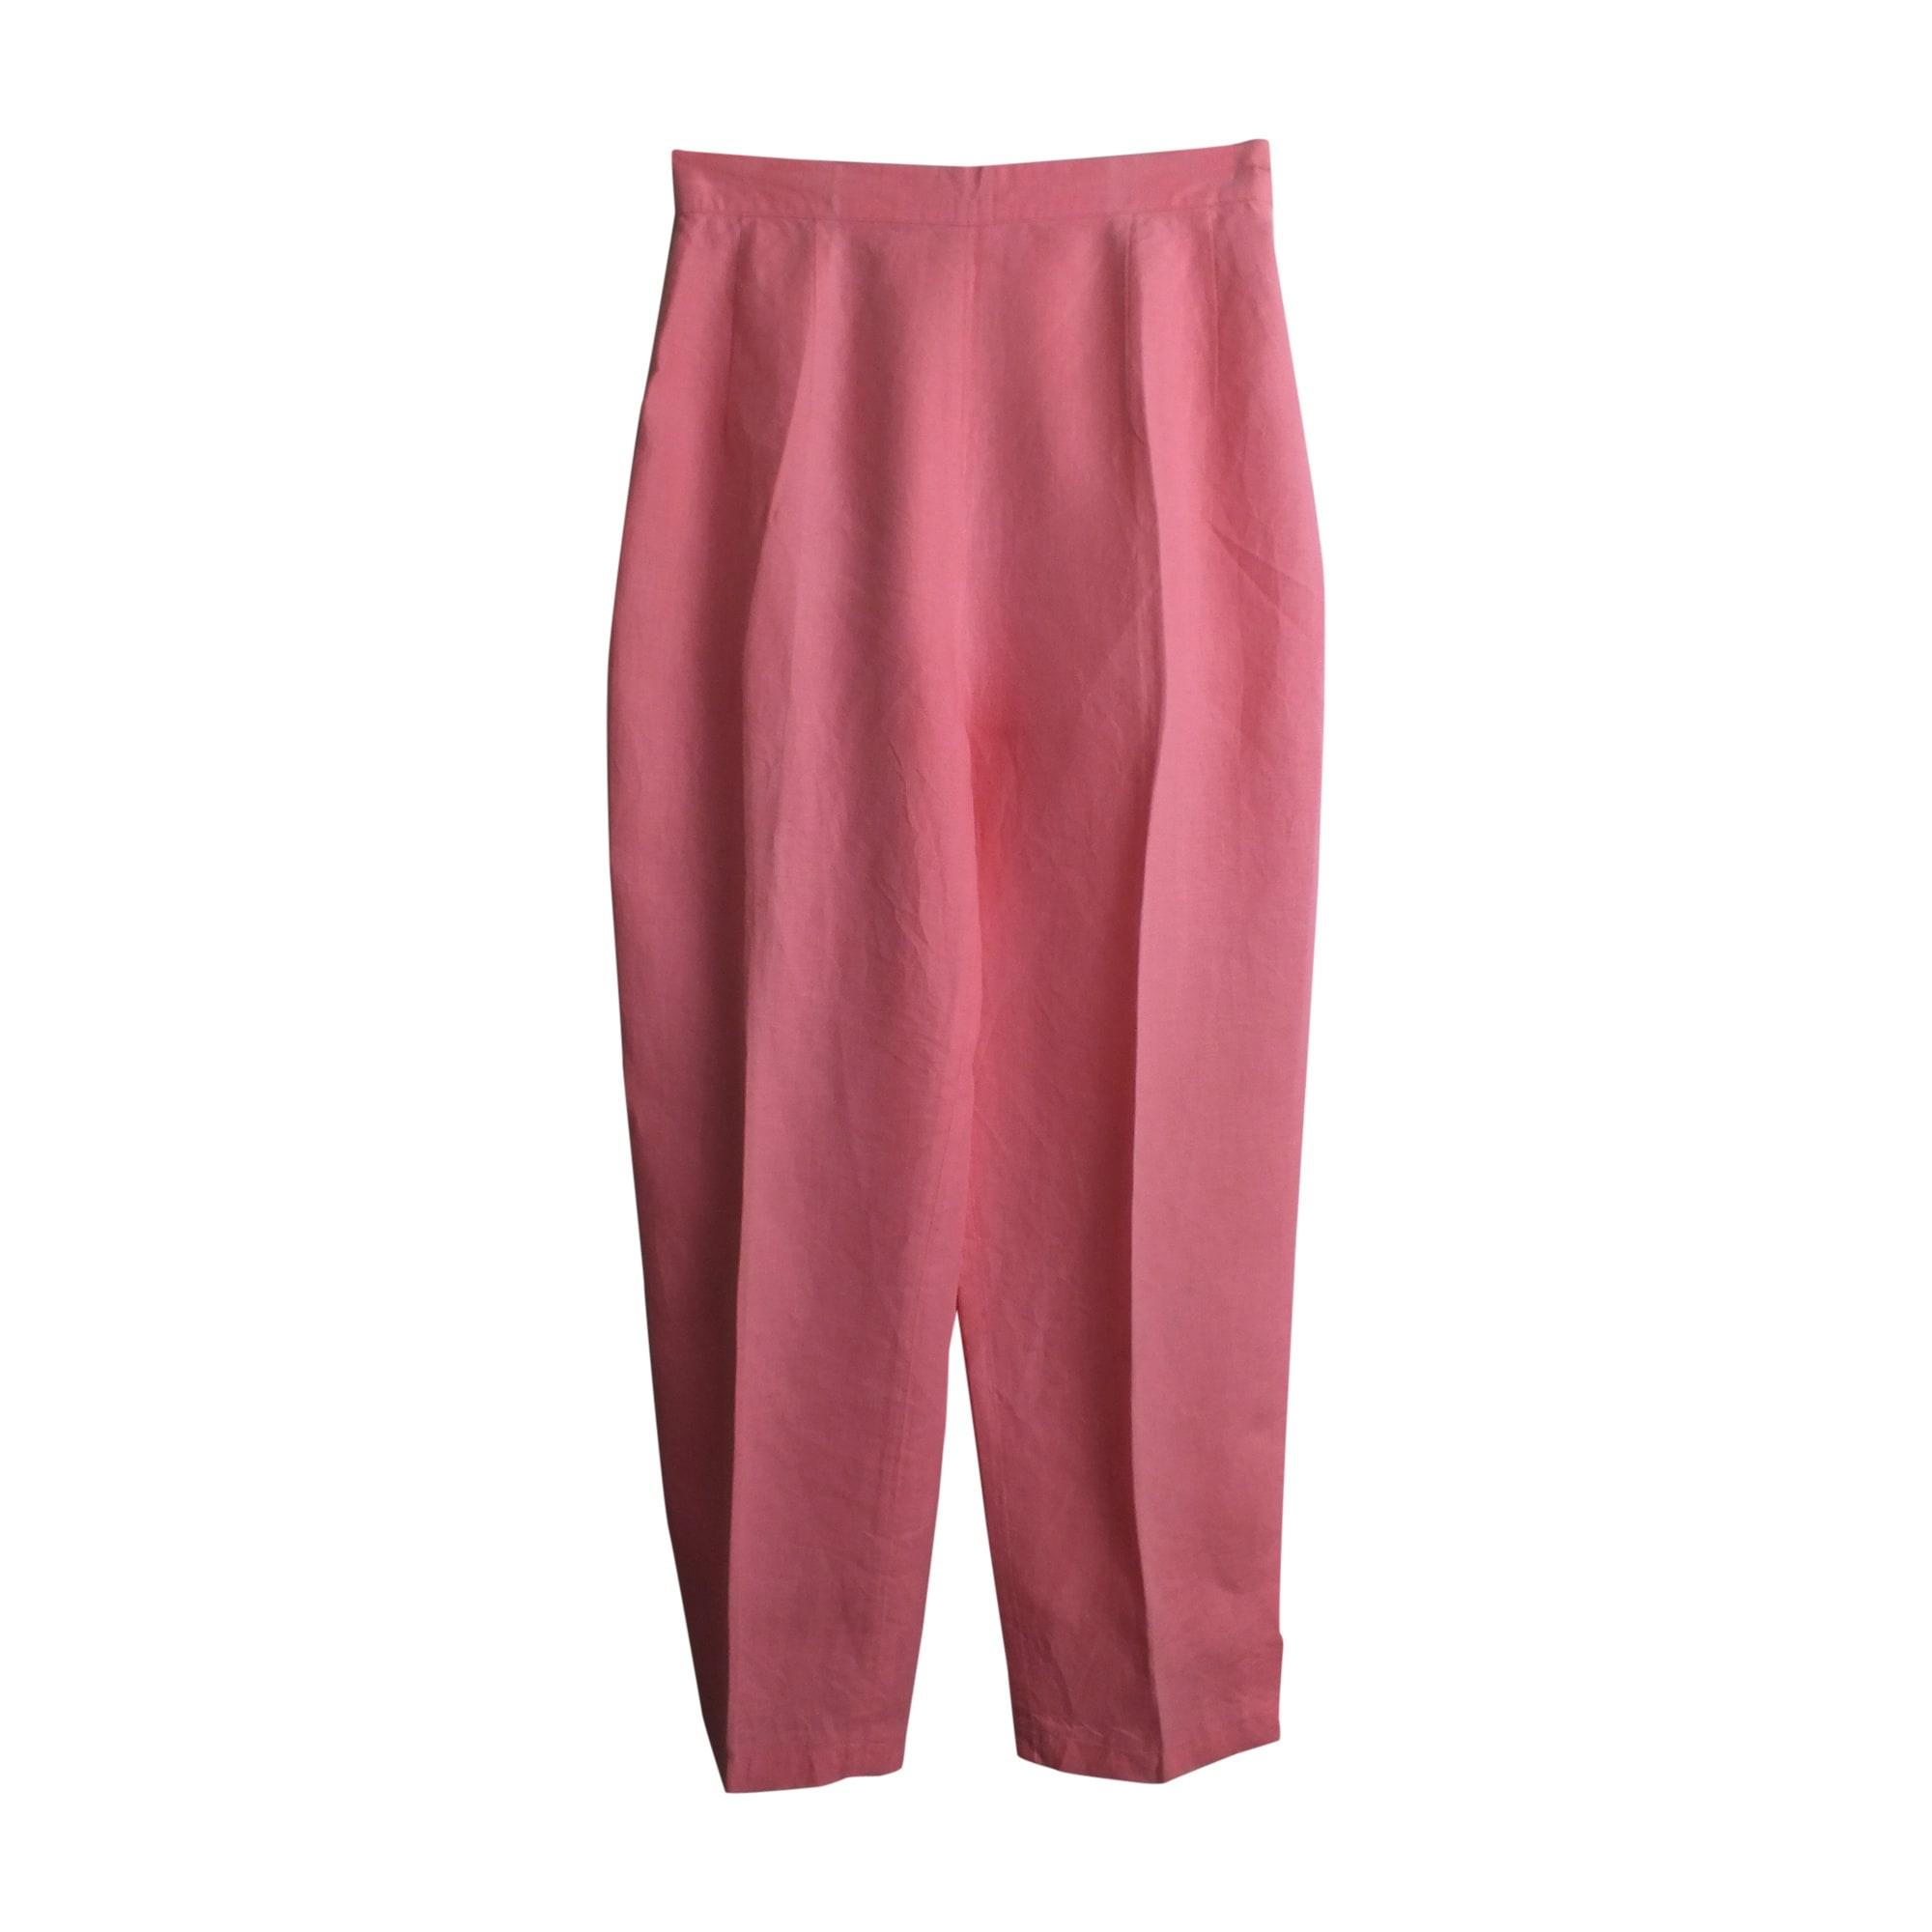 Pantalon carotte KENZO Rose, fuschia, vieux rose